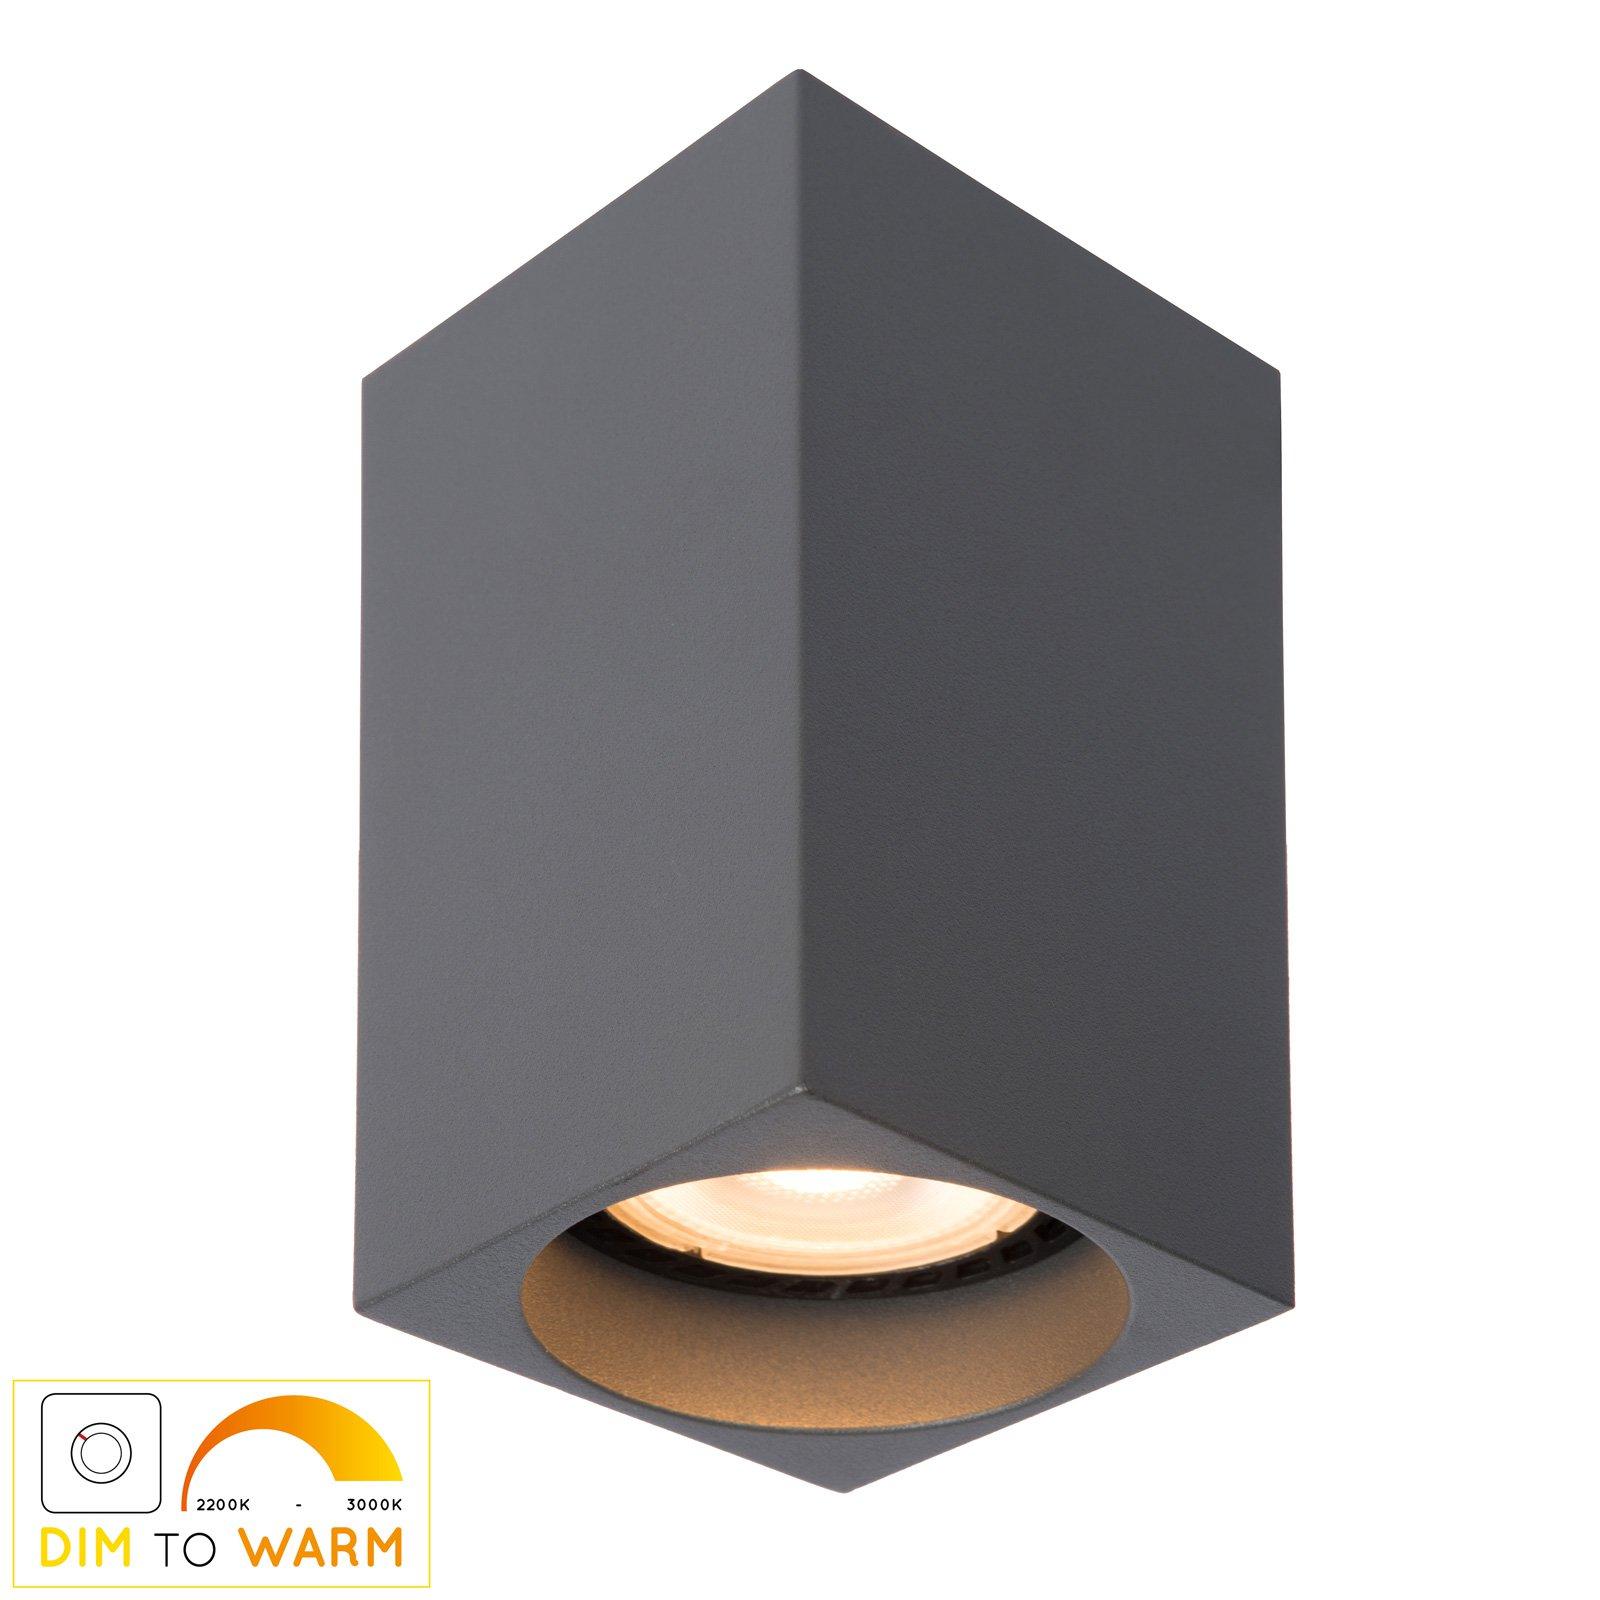 Delto LED-taklampe dim to warm, kantet, grå